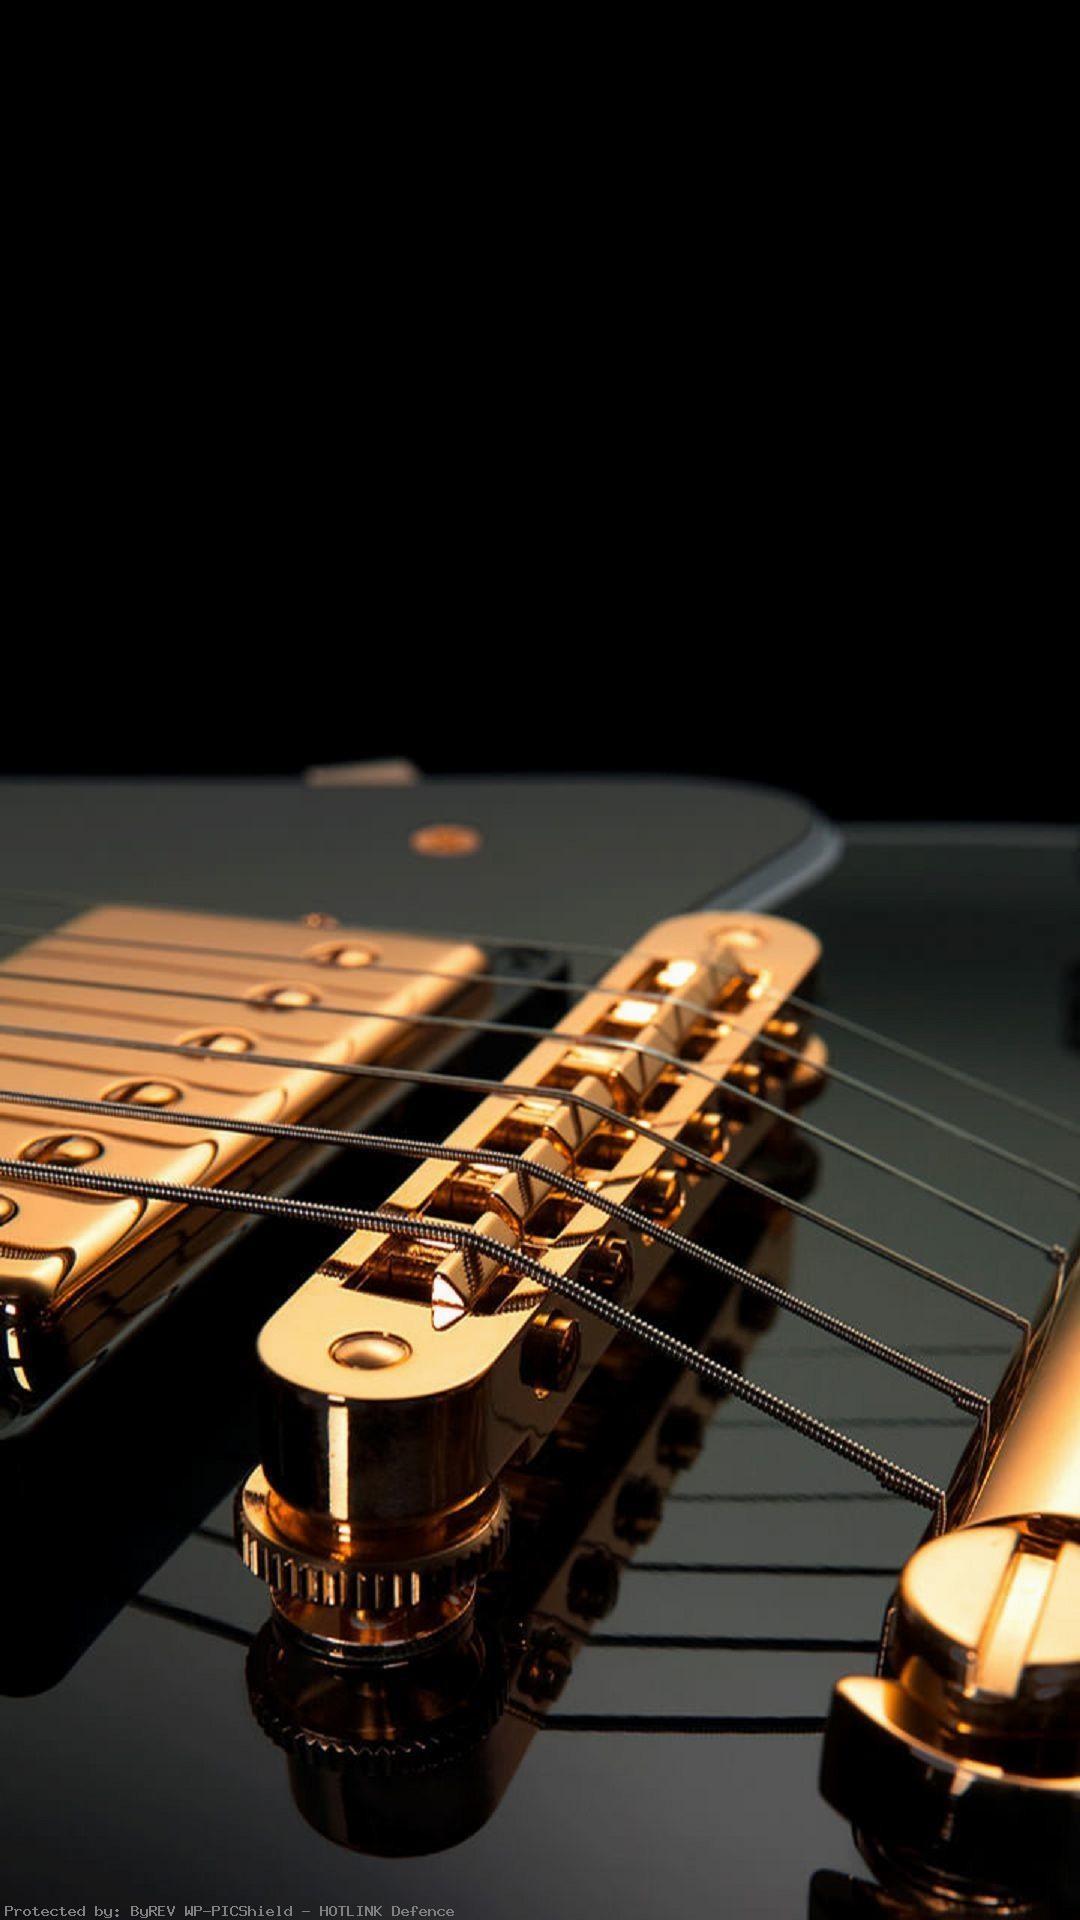 guitar-strings-black-gold-image-1080%C3%971920-